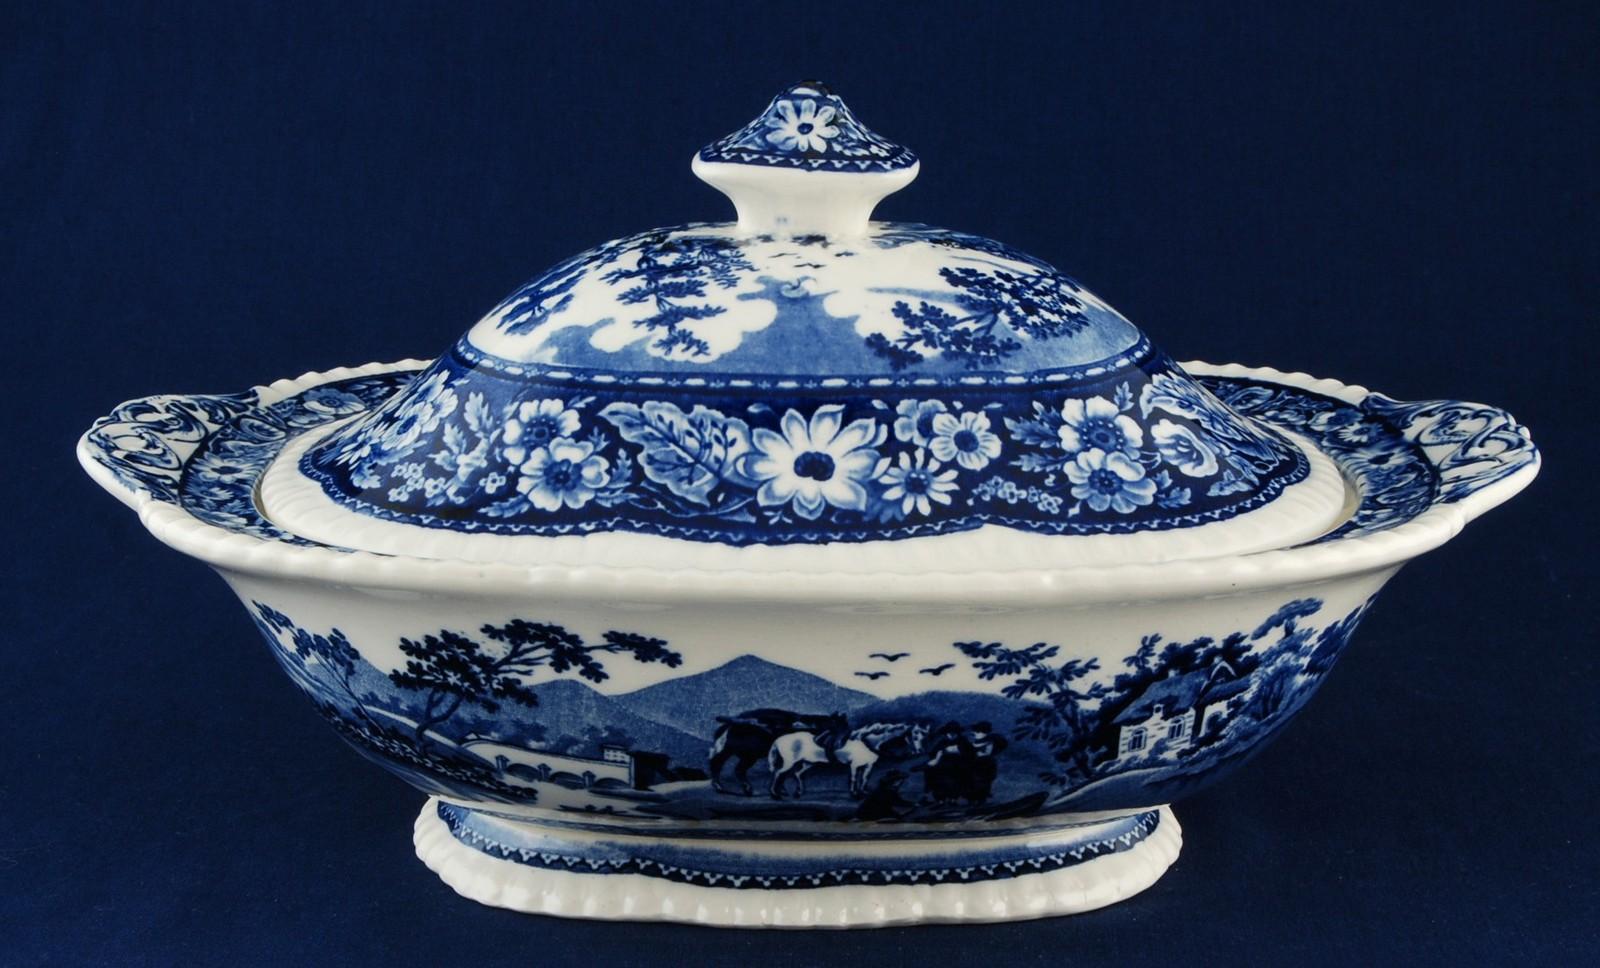 Royal Cauldon Native Blue & White Oval and 38 similar items